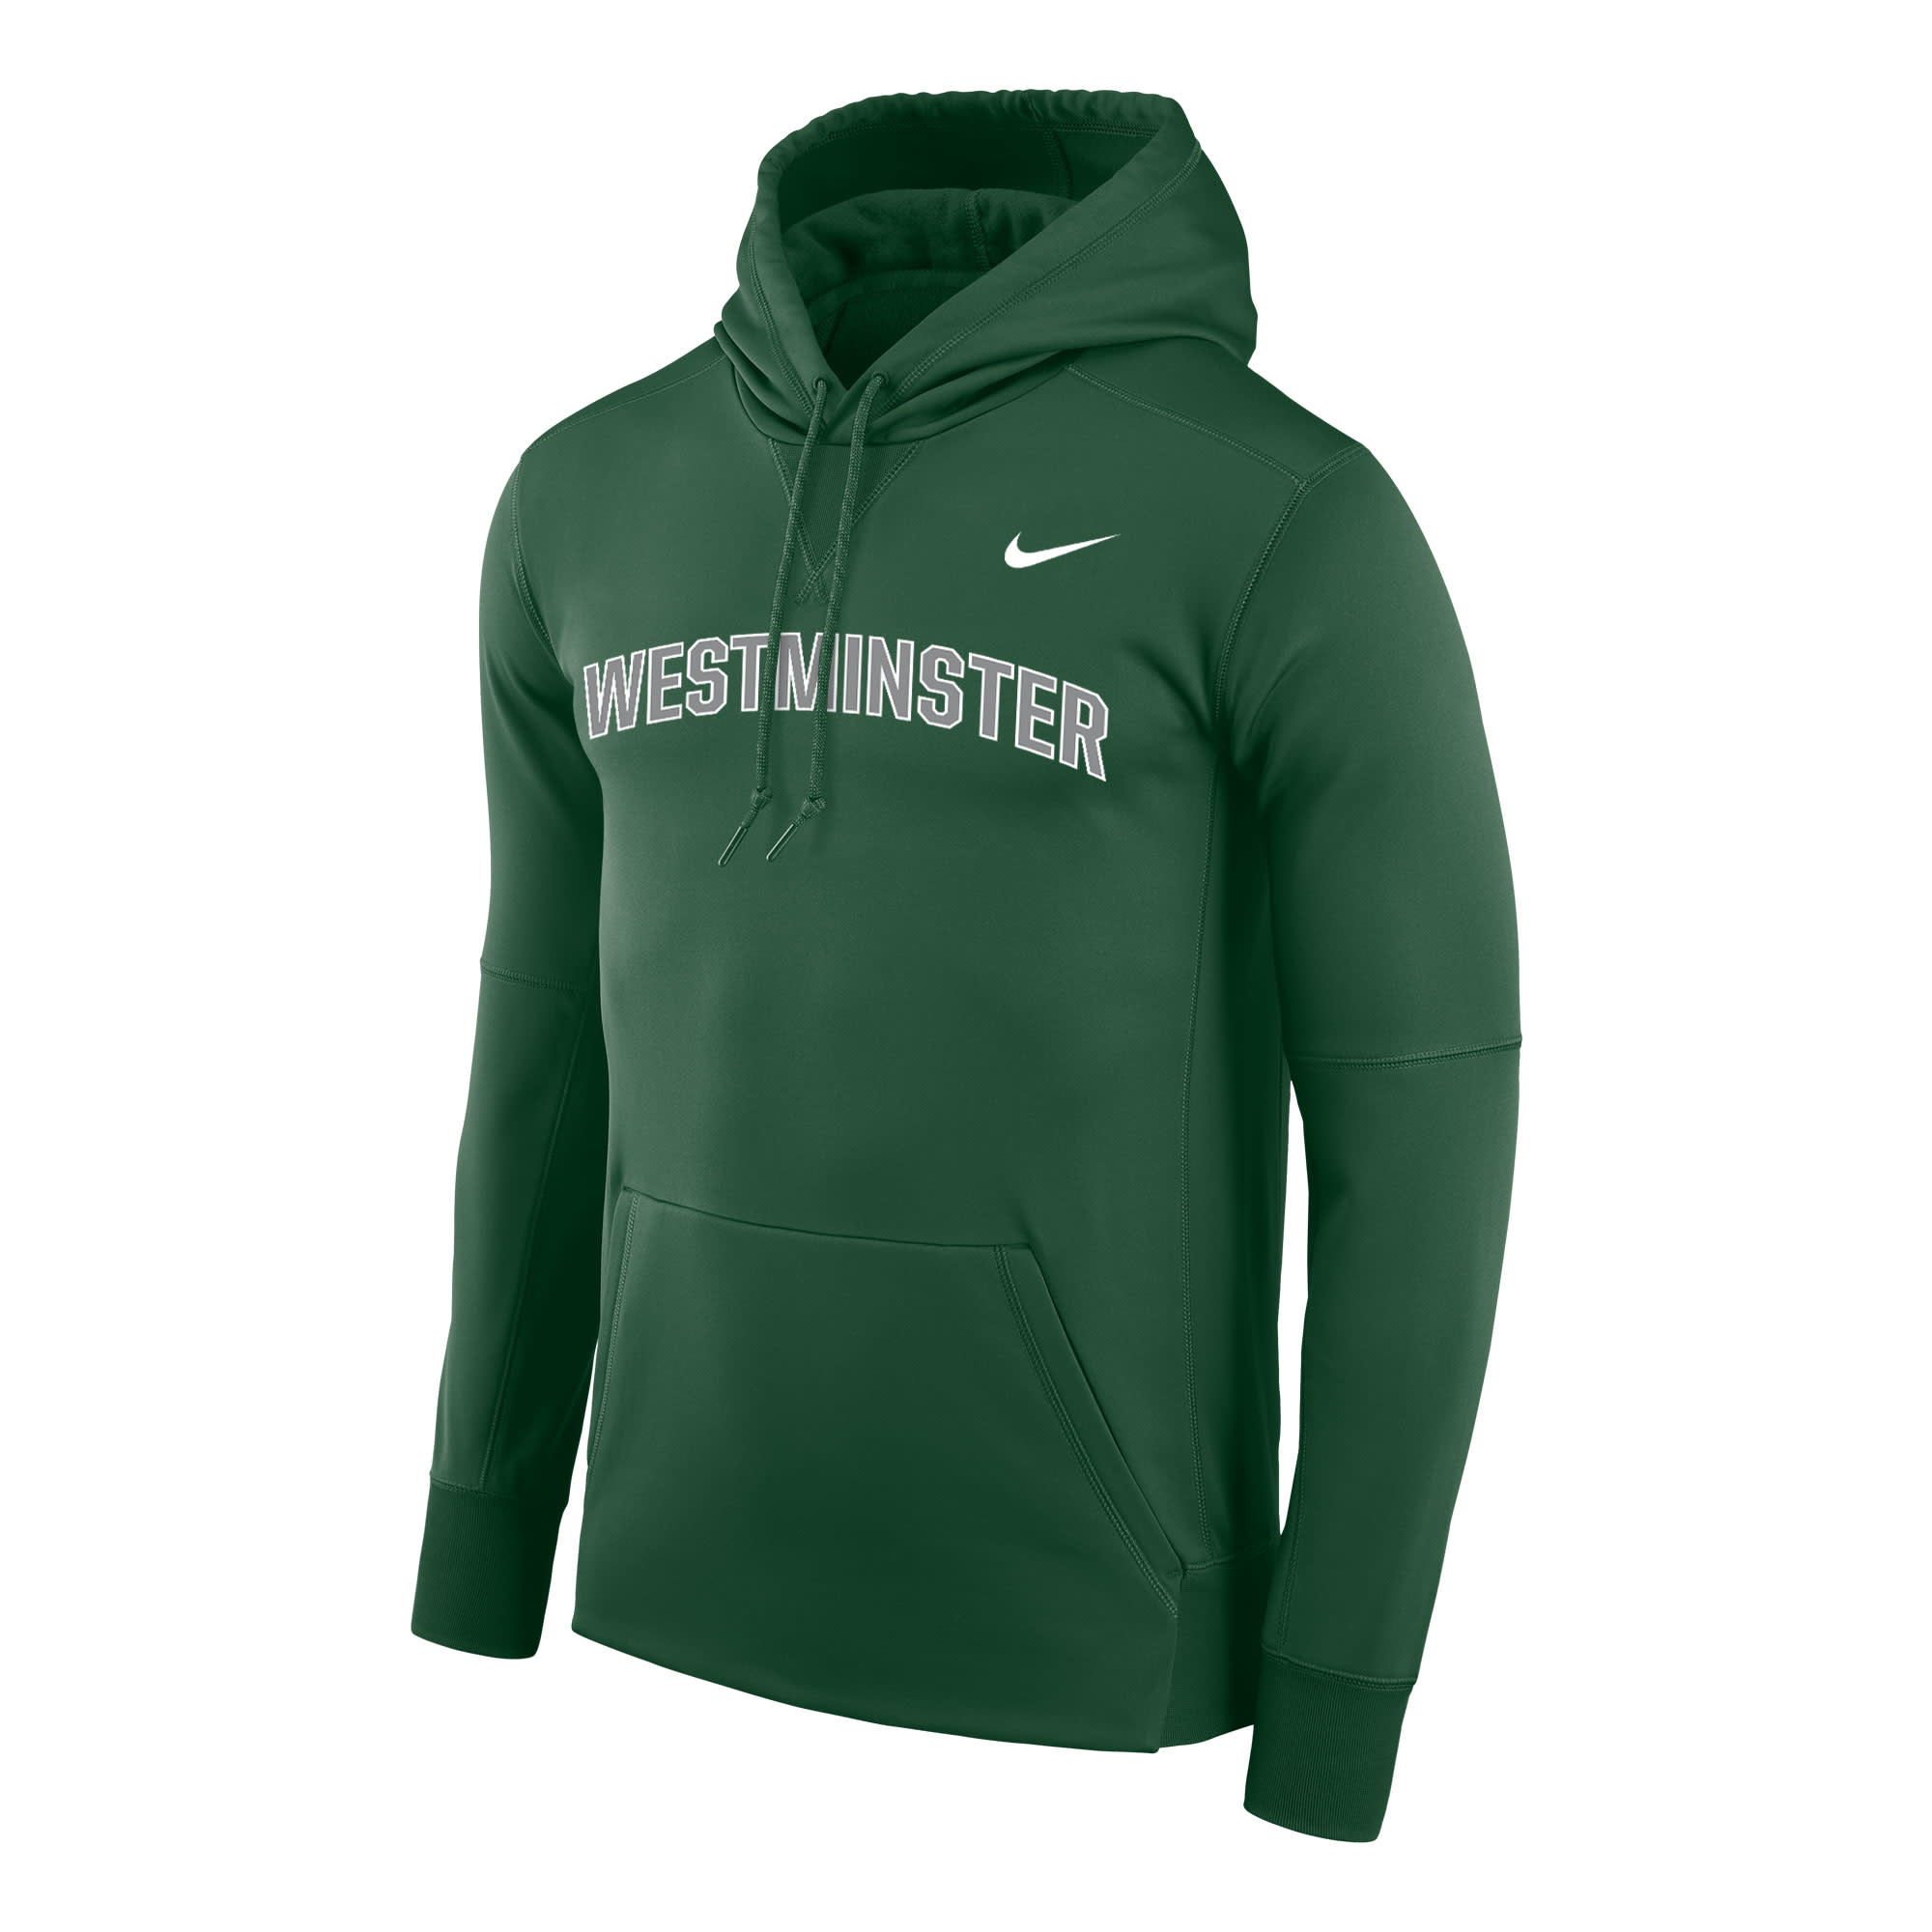 Sweatshirt: Nike KO Pullover Hoody Green